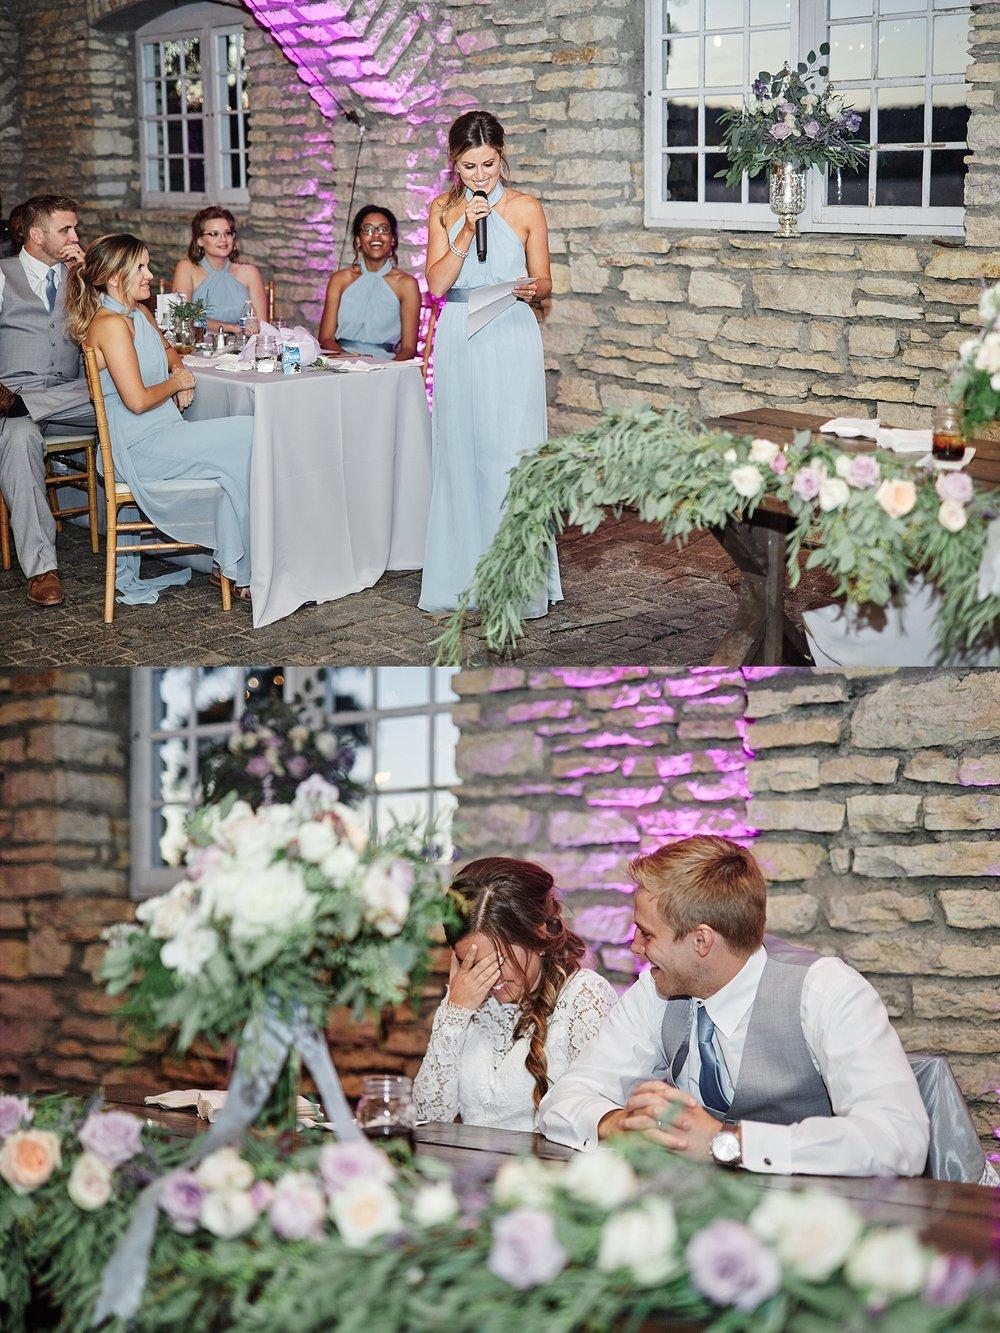 Maywood-Stone-Barn-Wedding-Rochester-Minnesota-Perry-James-Photo_0685.jpg